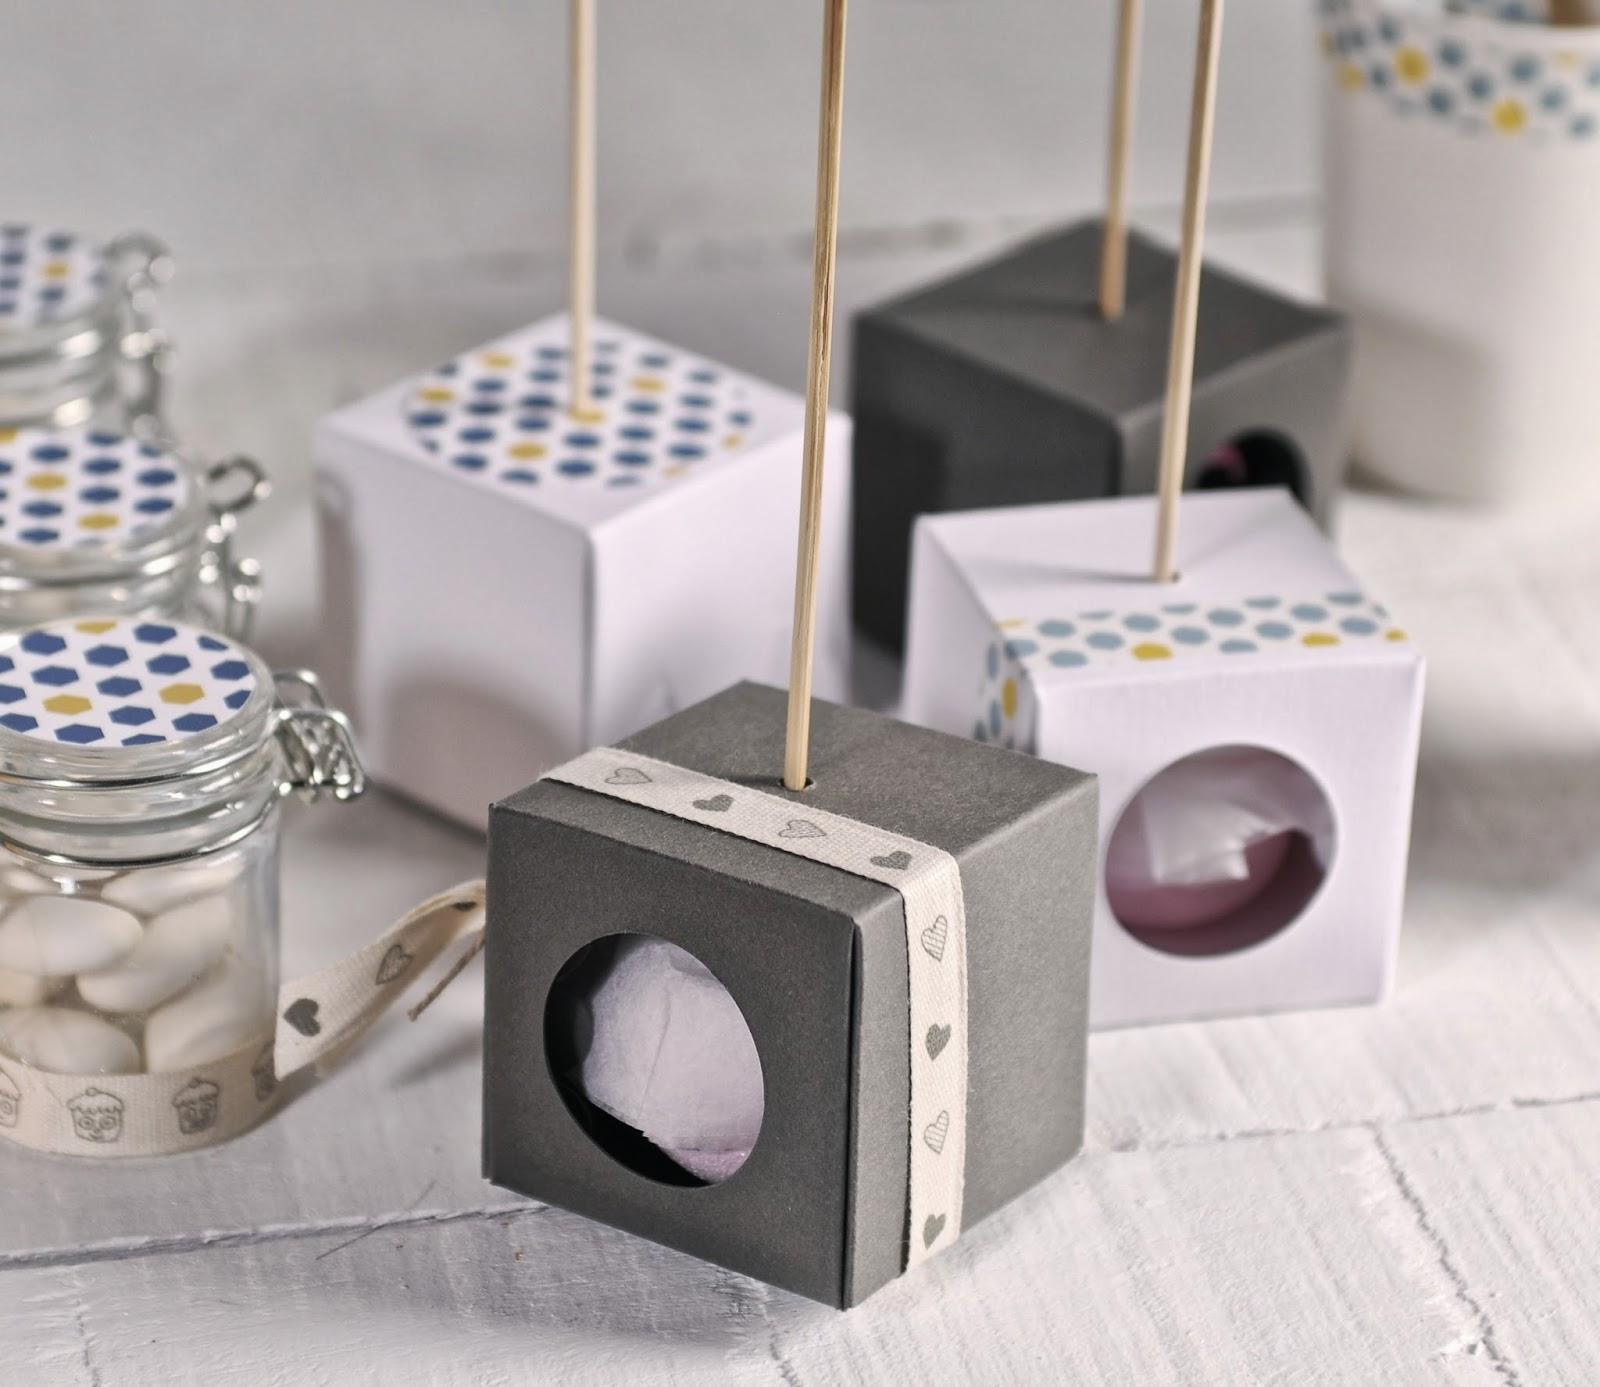 cajas para un cake pop, cajas para 1 cake pop, cajas para cake pops, detalles para boda, ideas para regalar en bodas